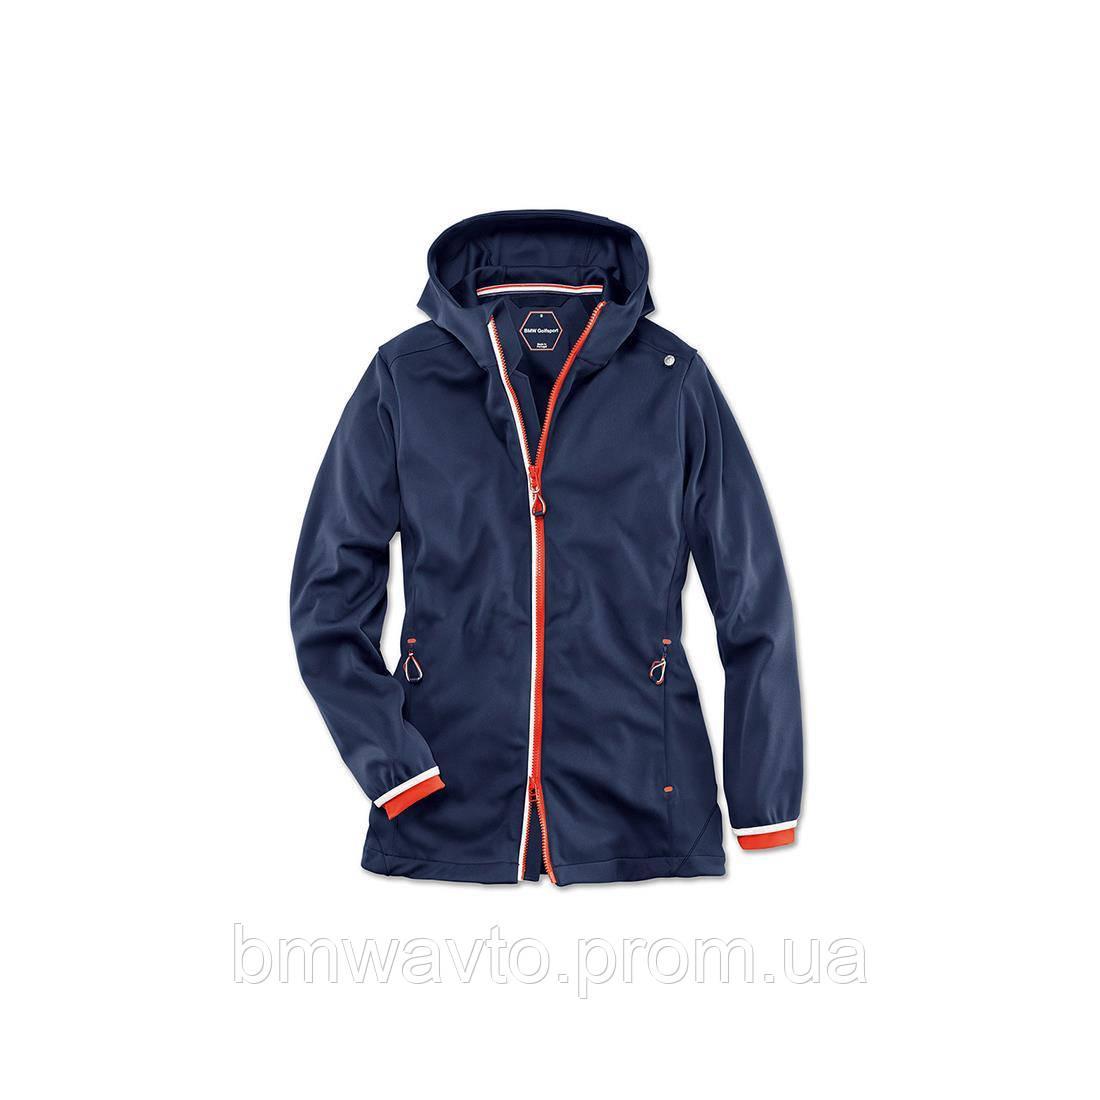 Женская куртка BMW Golfsport Functional Jacket, Ladies